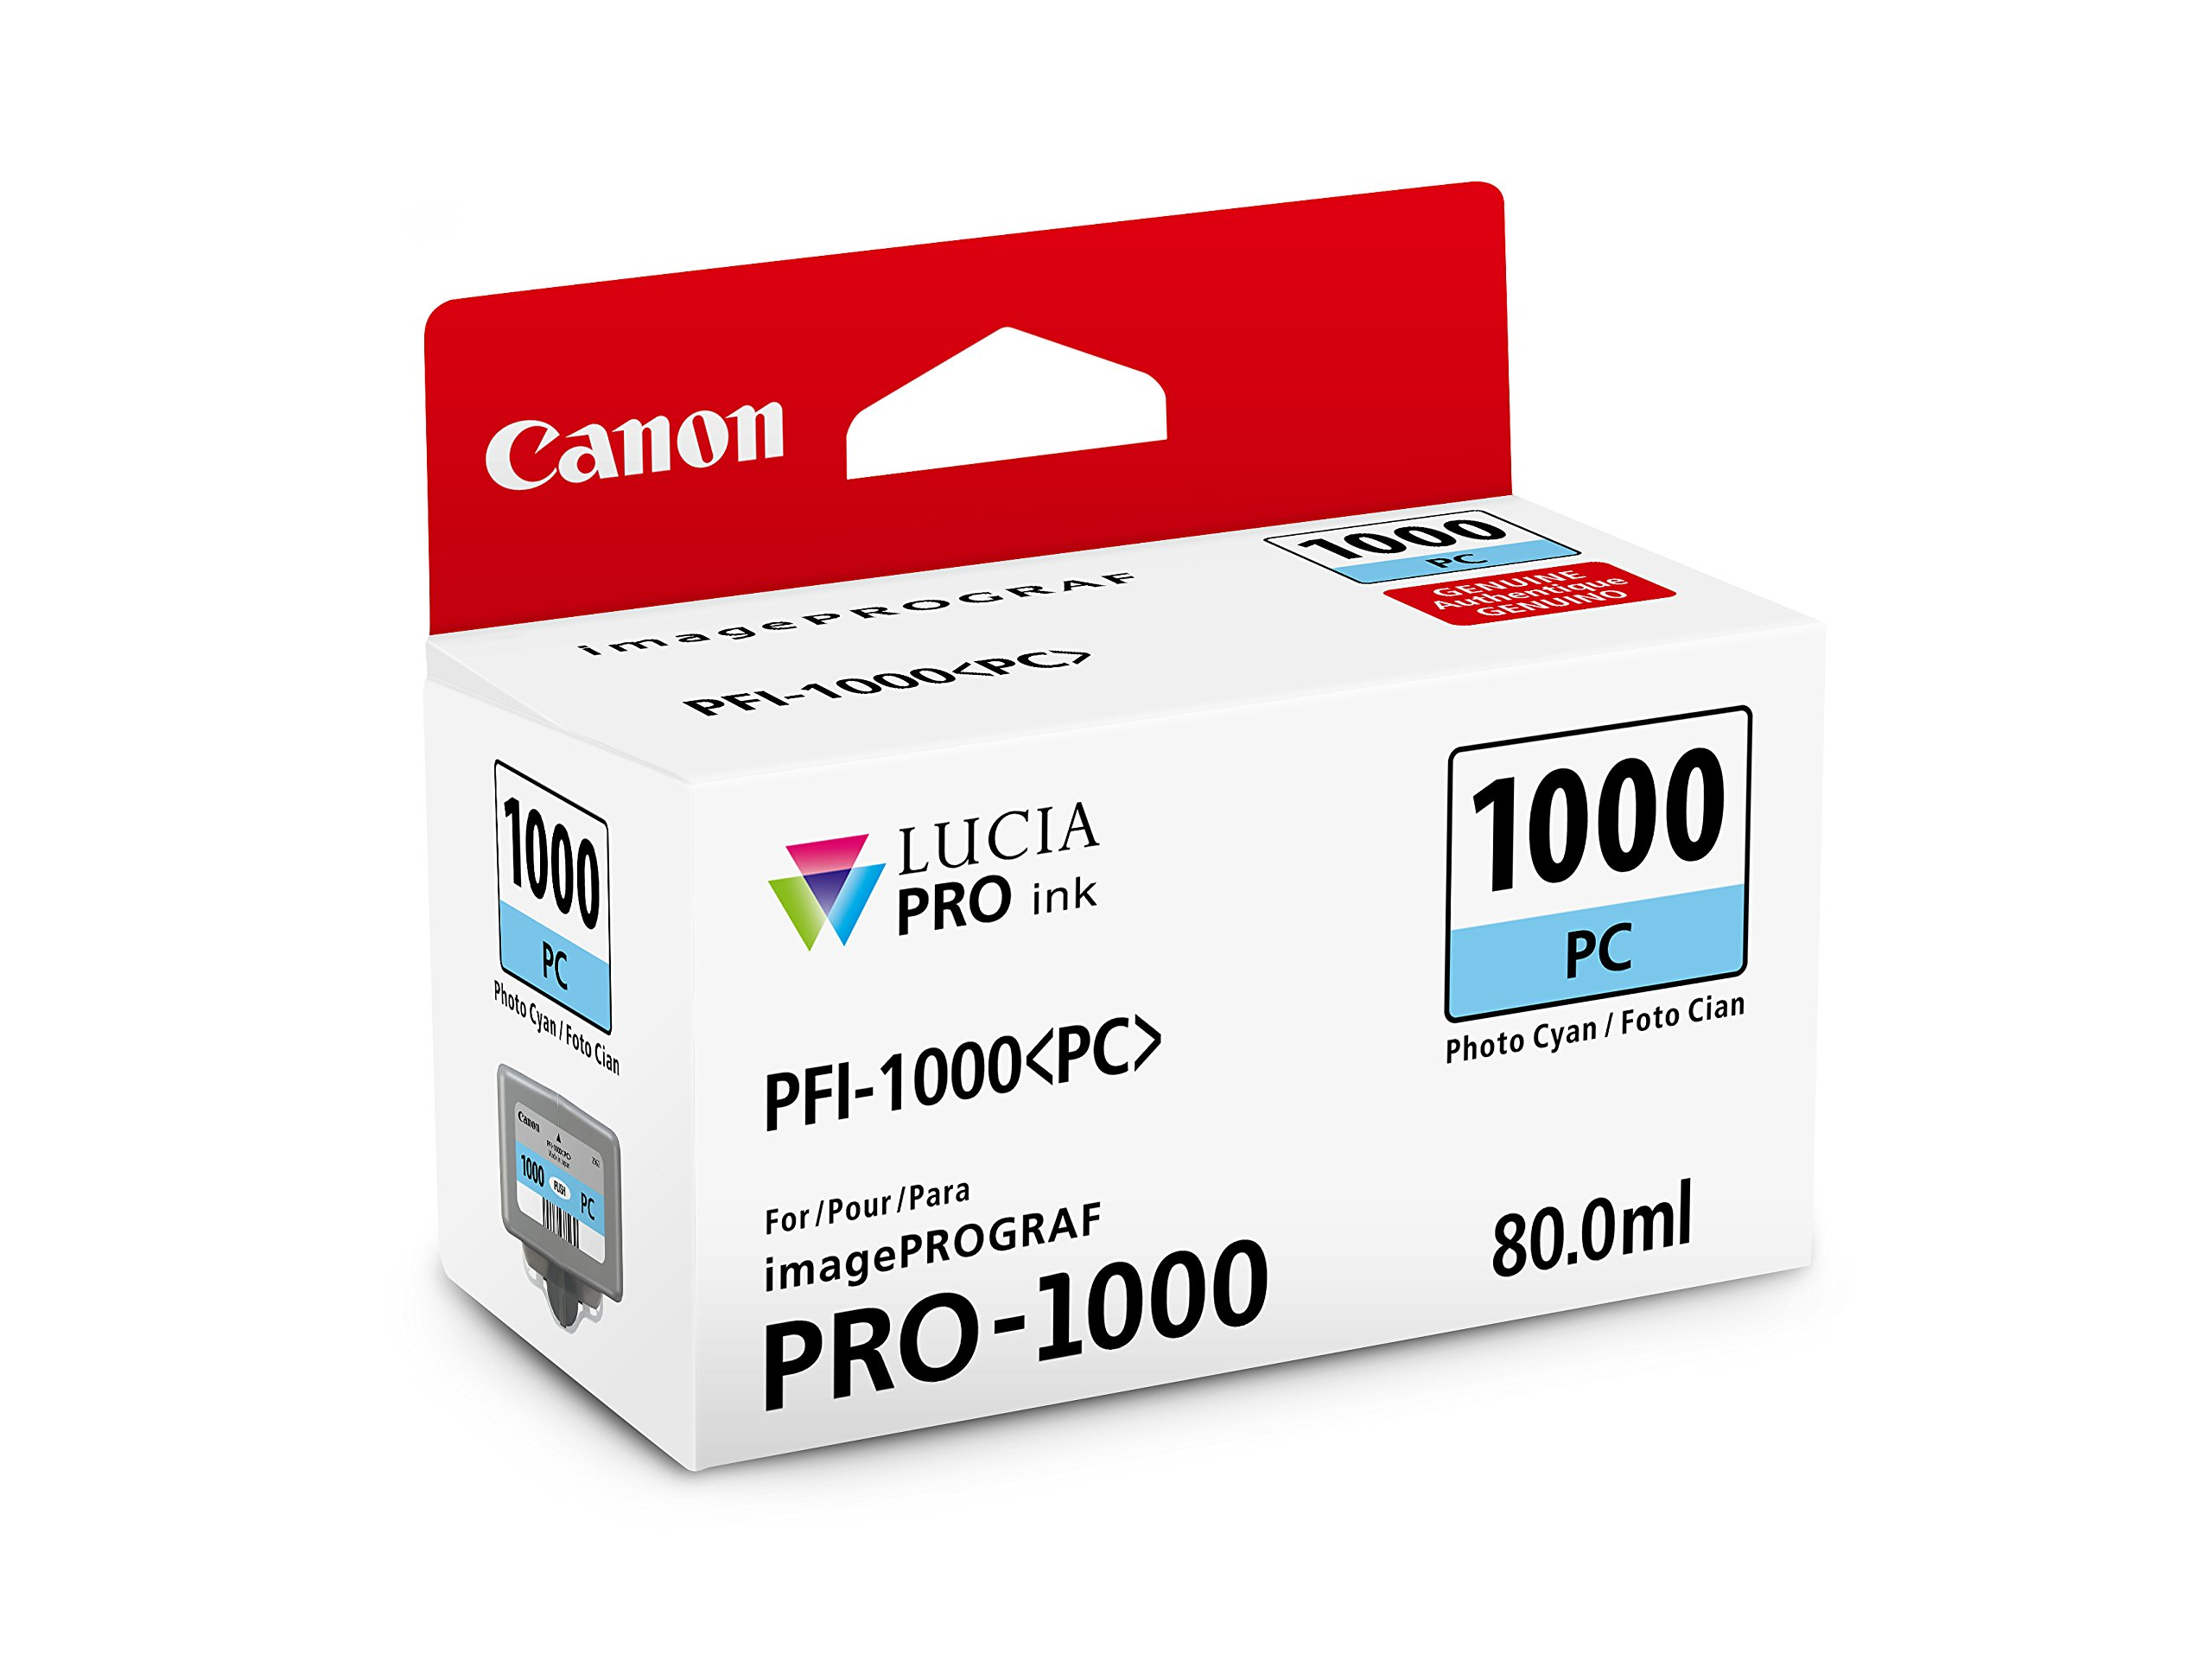 CanonInk LUCIA PRO PFI-1000 Photo Cyan Individual Ink Tank